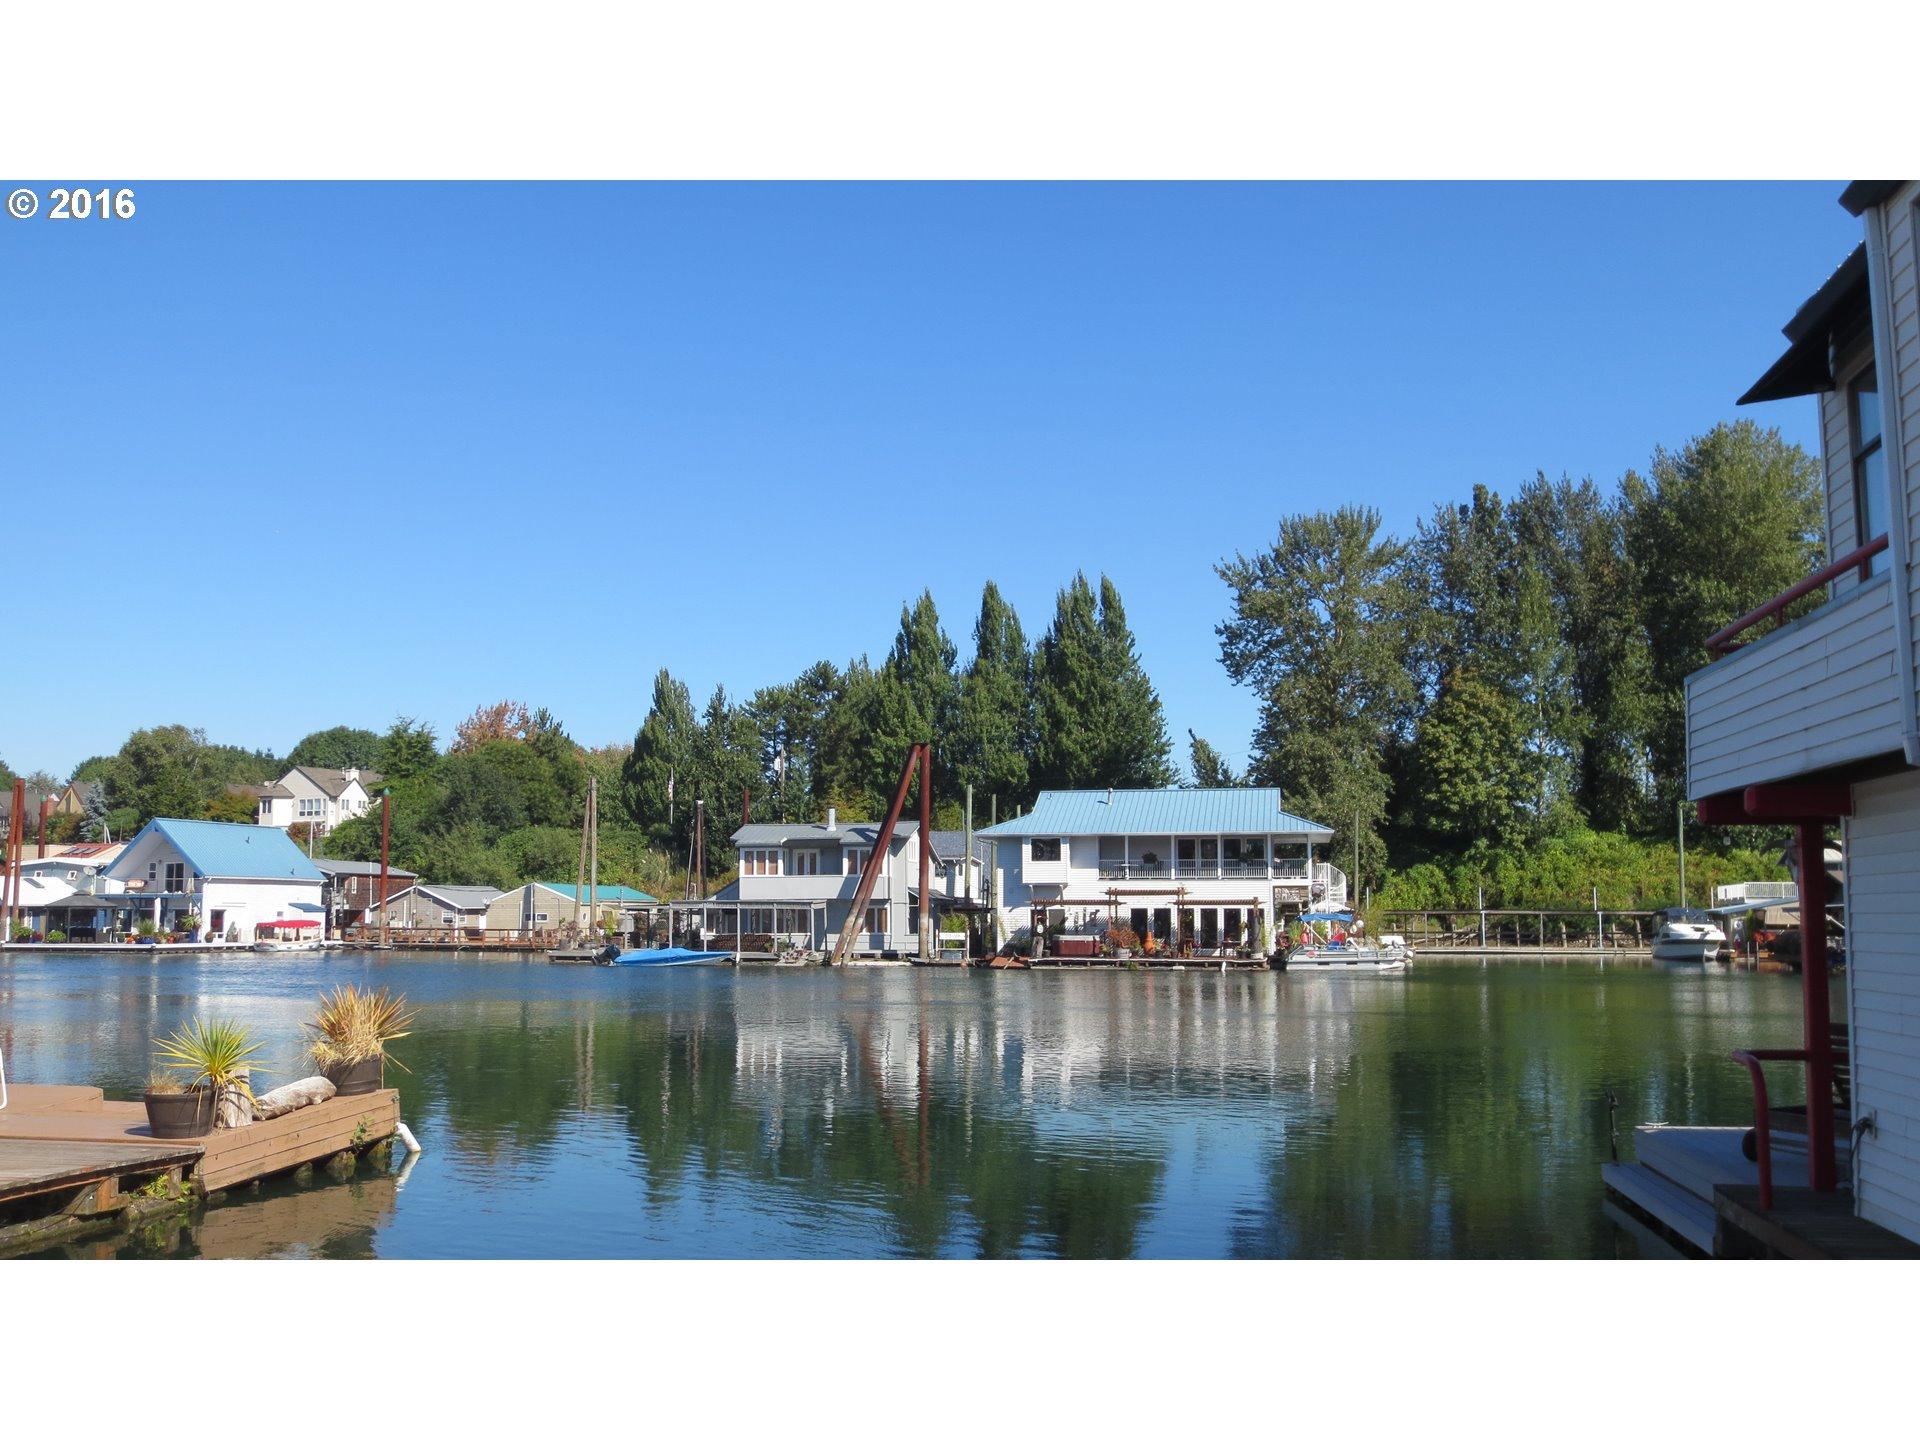 Floating Homes For Sale In Portland Oregon Houseboats